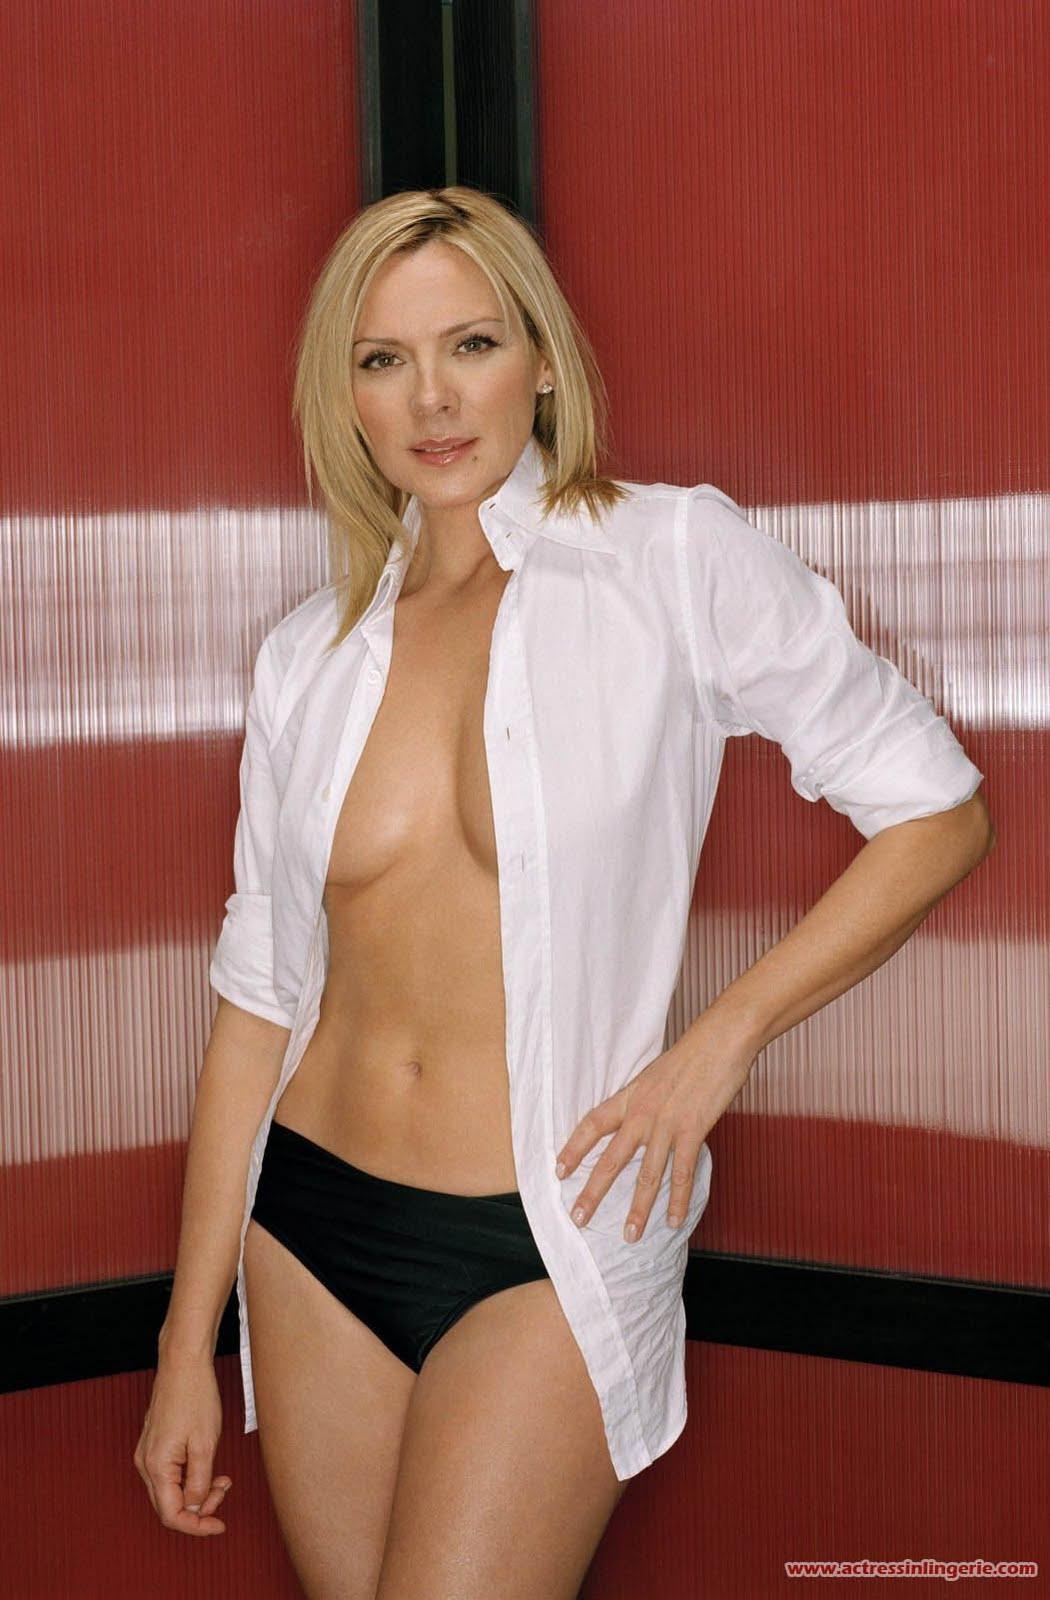 http://1.bp.blogspot.com/_JFX5_9i0Xng/TAvTu884SkI/AAAAAAAAEKU/daxluG_V_UE/s1600/Kim_Cattrall_Sexy_in_Lingerie+1.jpg